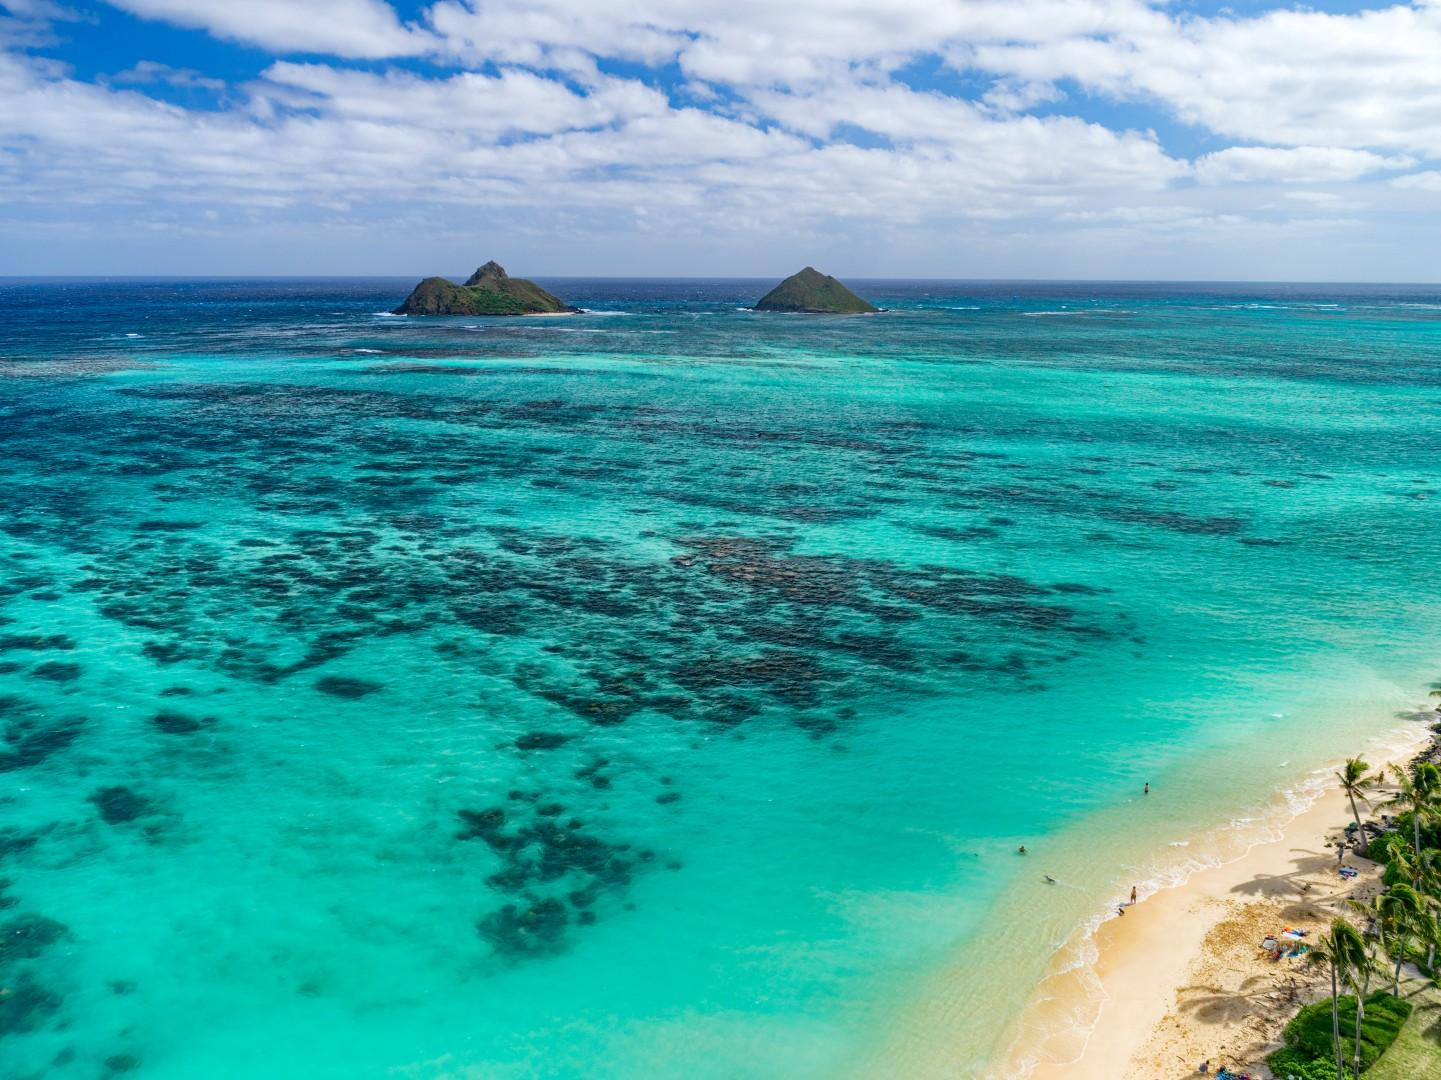 Lanikai Beach and the Mokulua Islands.